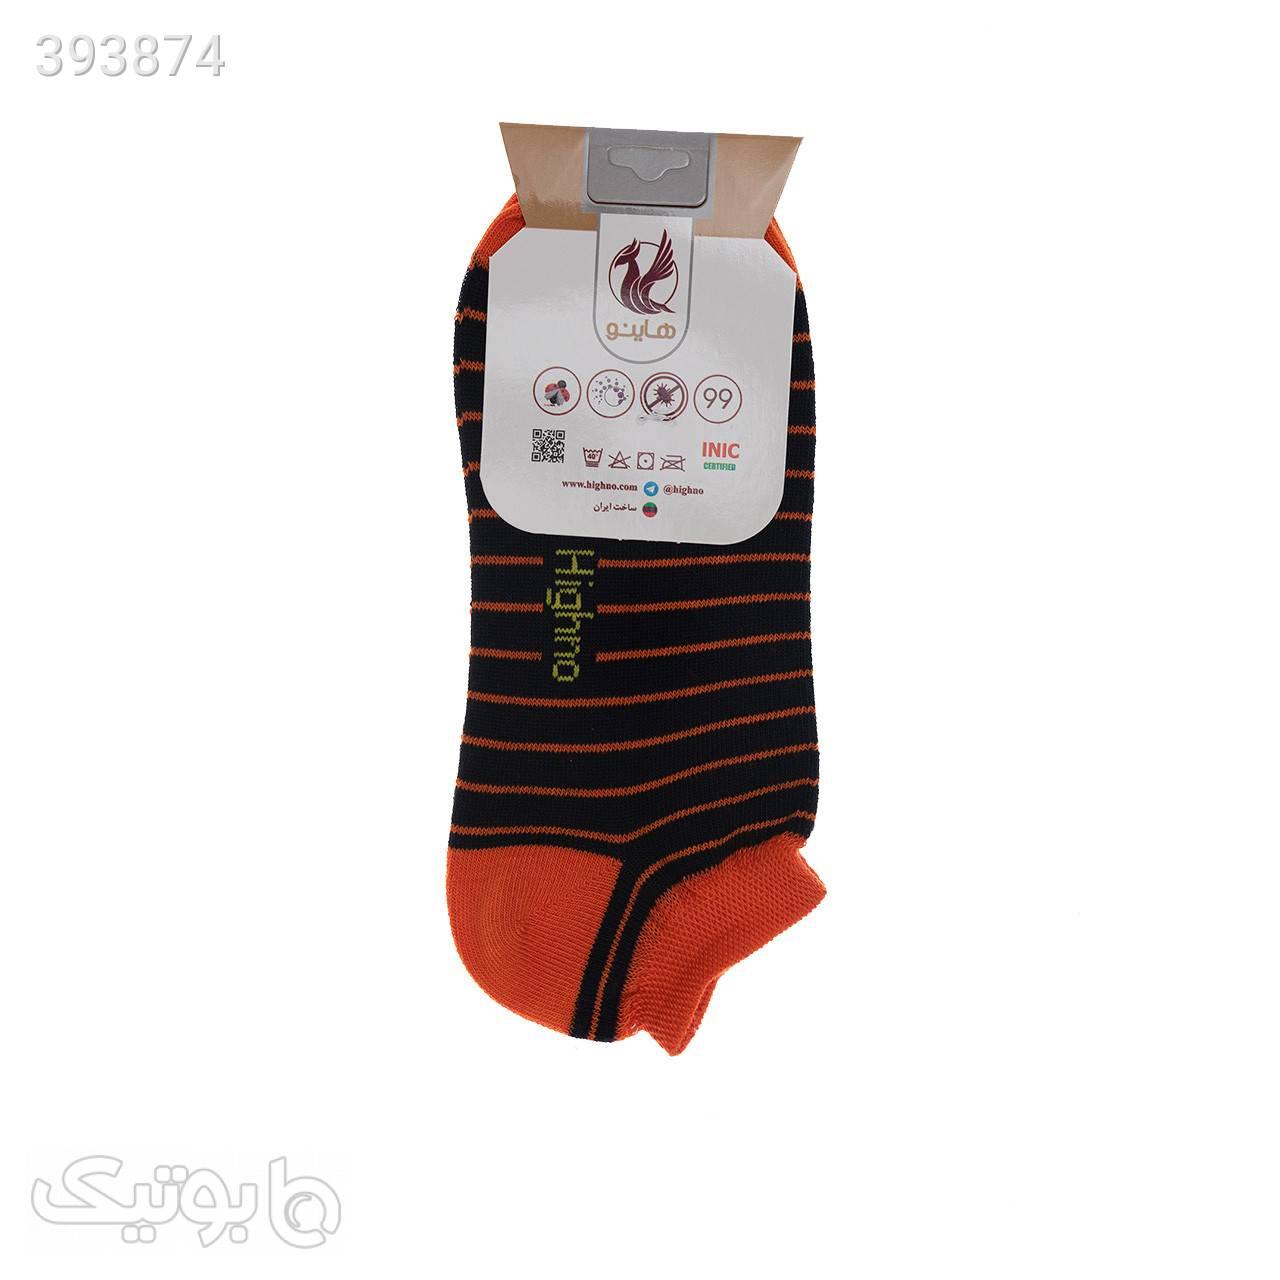 جوراب آنتی باکتریال زنانه مدل 0609-1240 مشکی جوراب و پاپوش